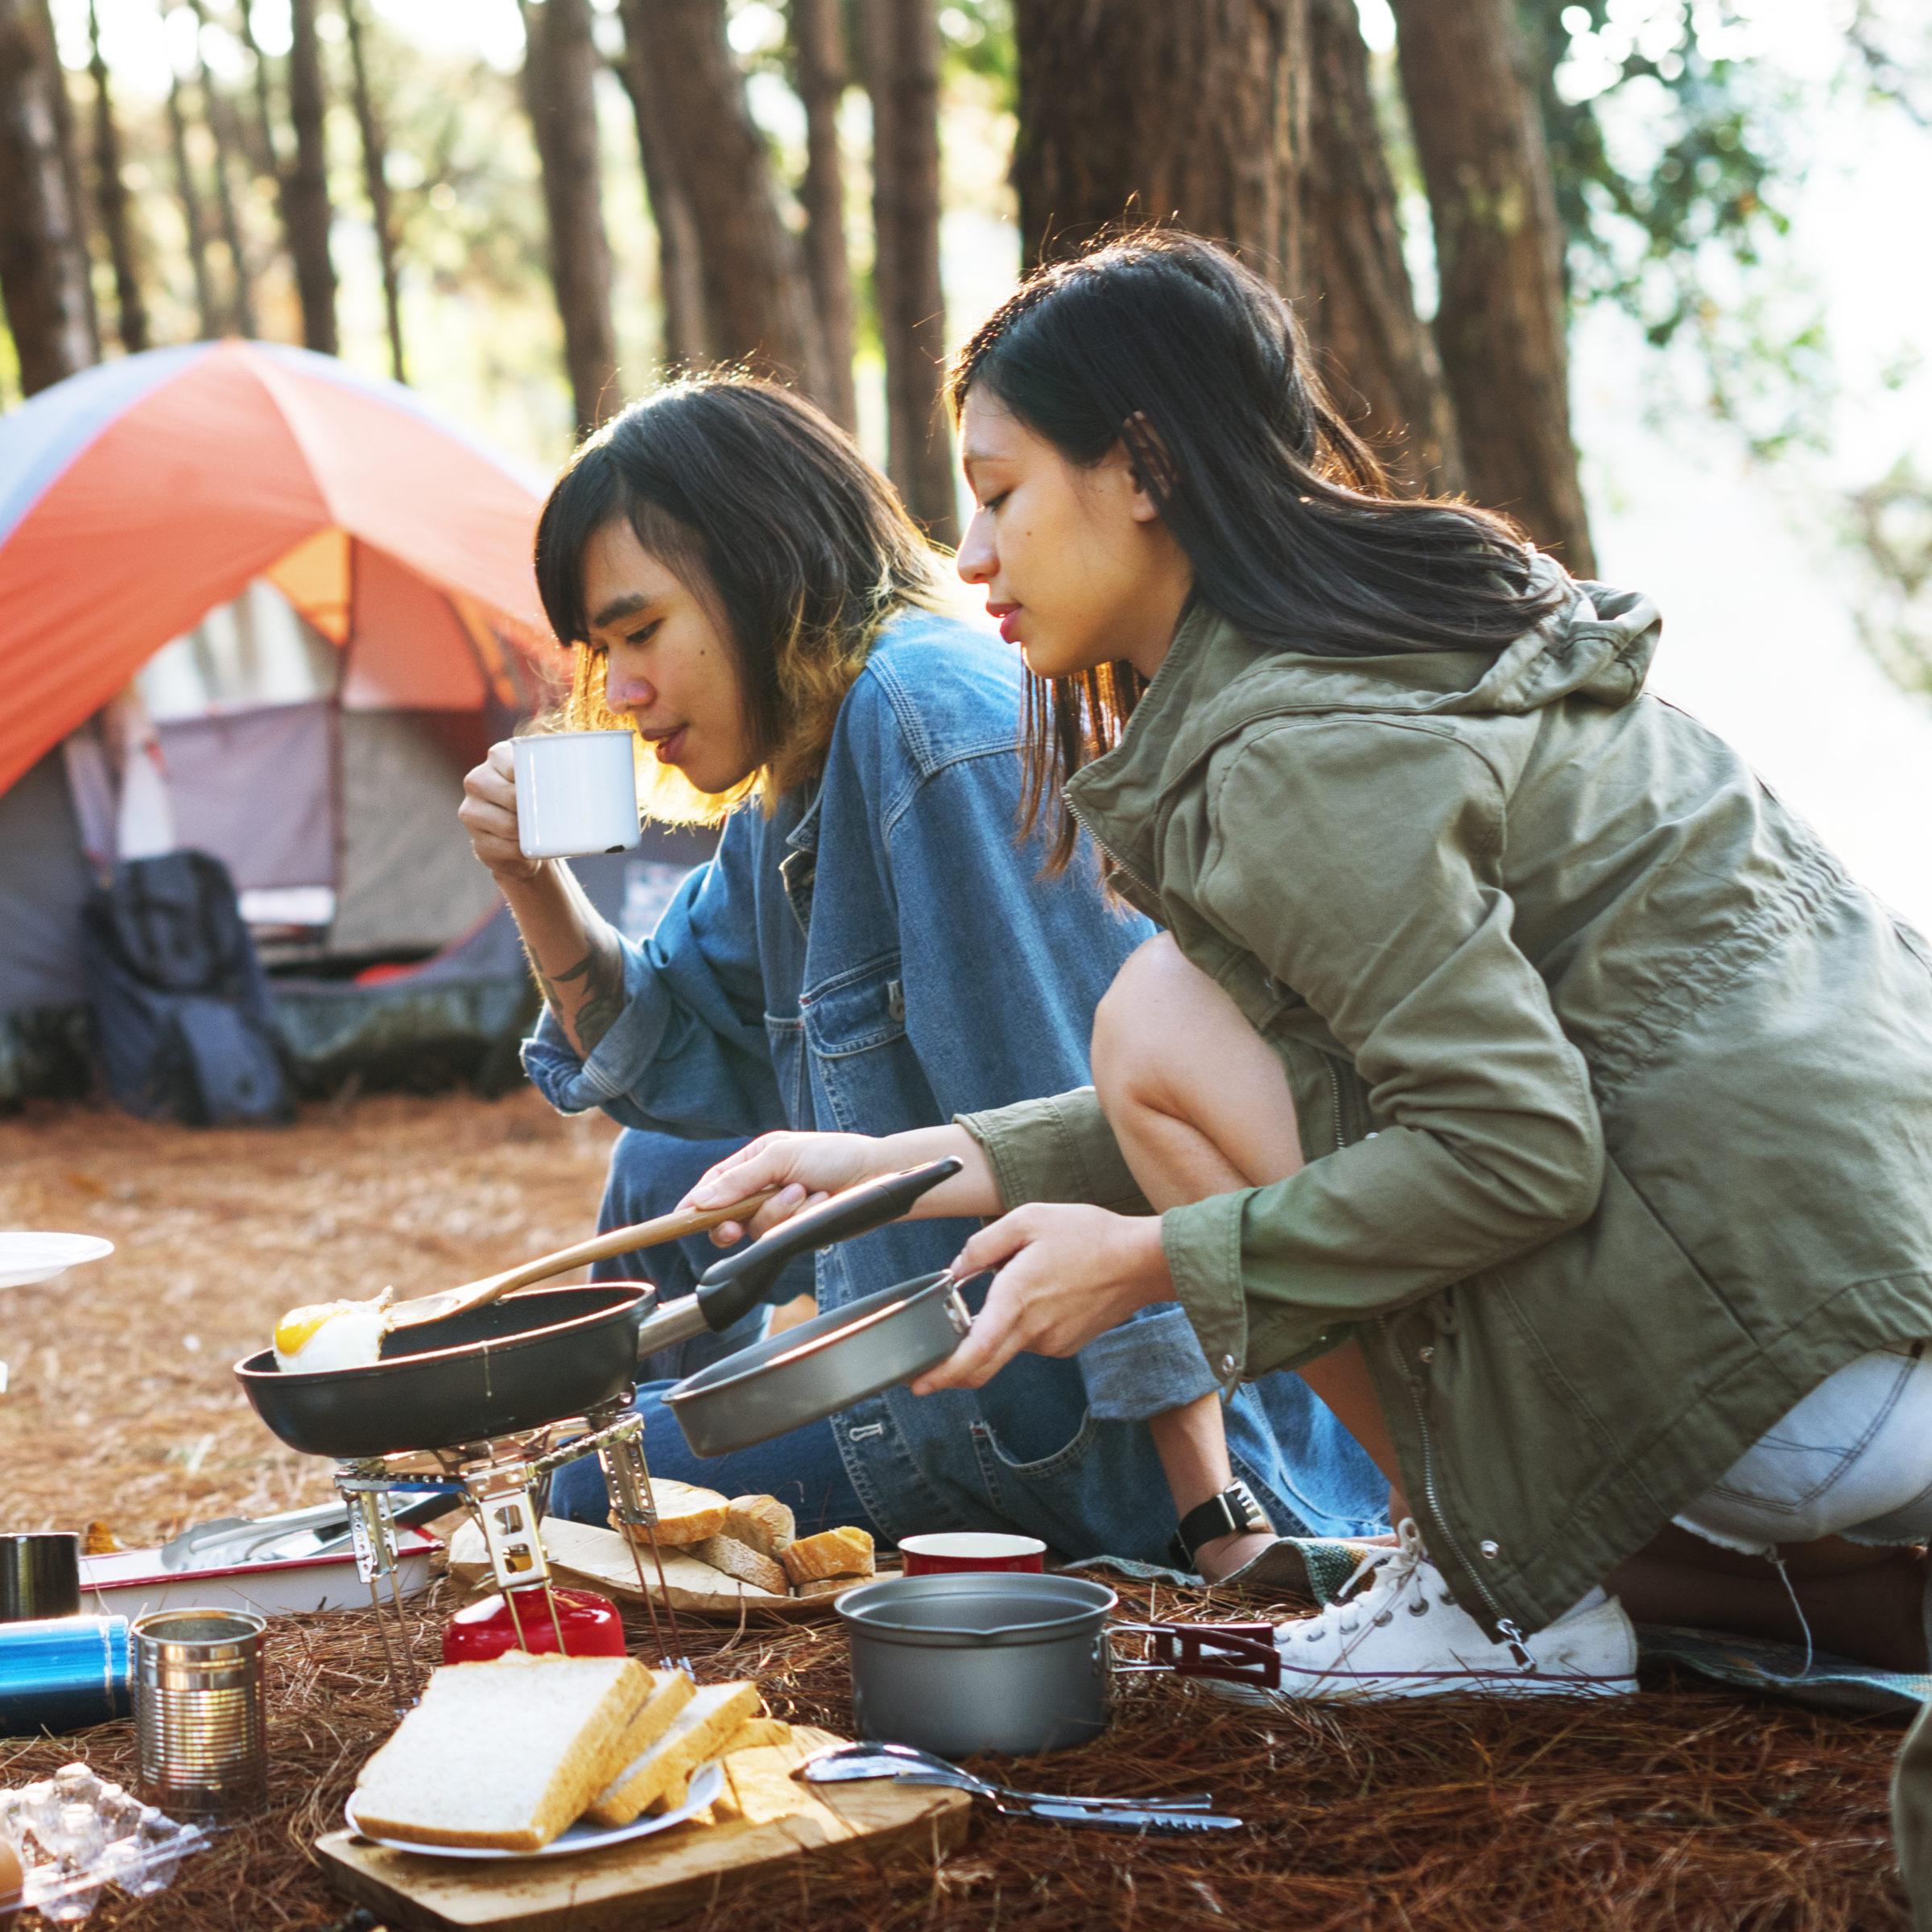 hangout traveling destination camping concept PEB6KPH